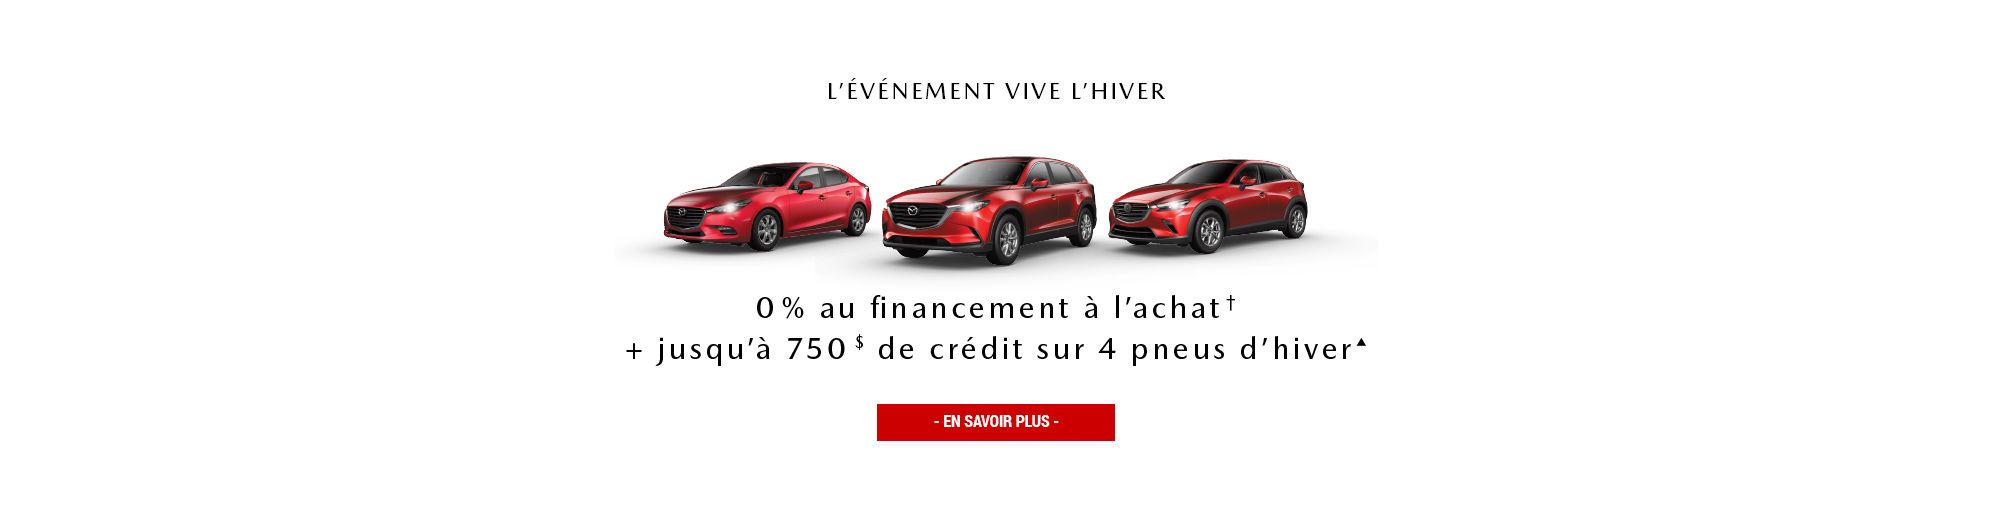 Événement Vive l'hiver Mazda Janvier 2019 Main Header